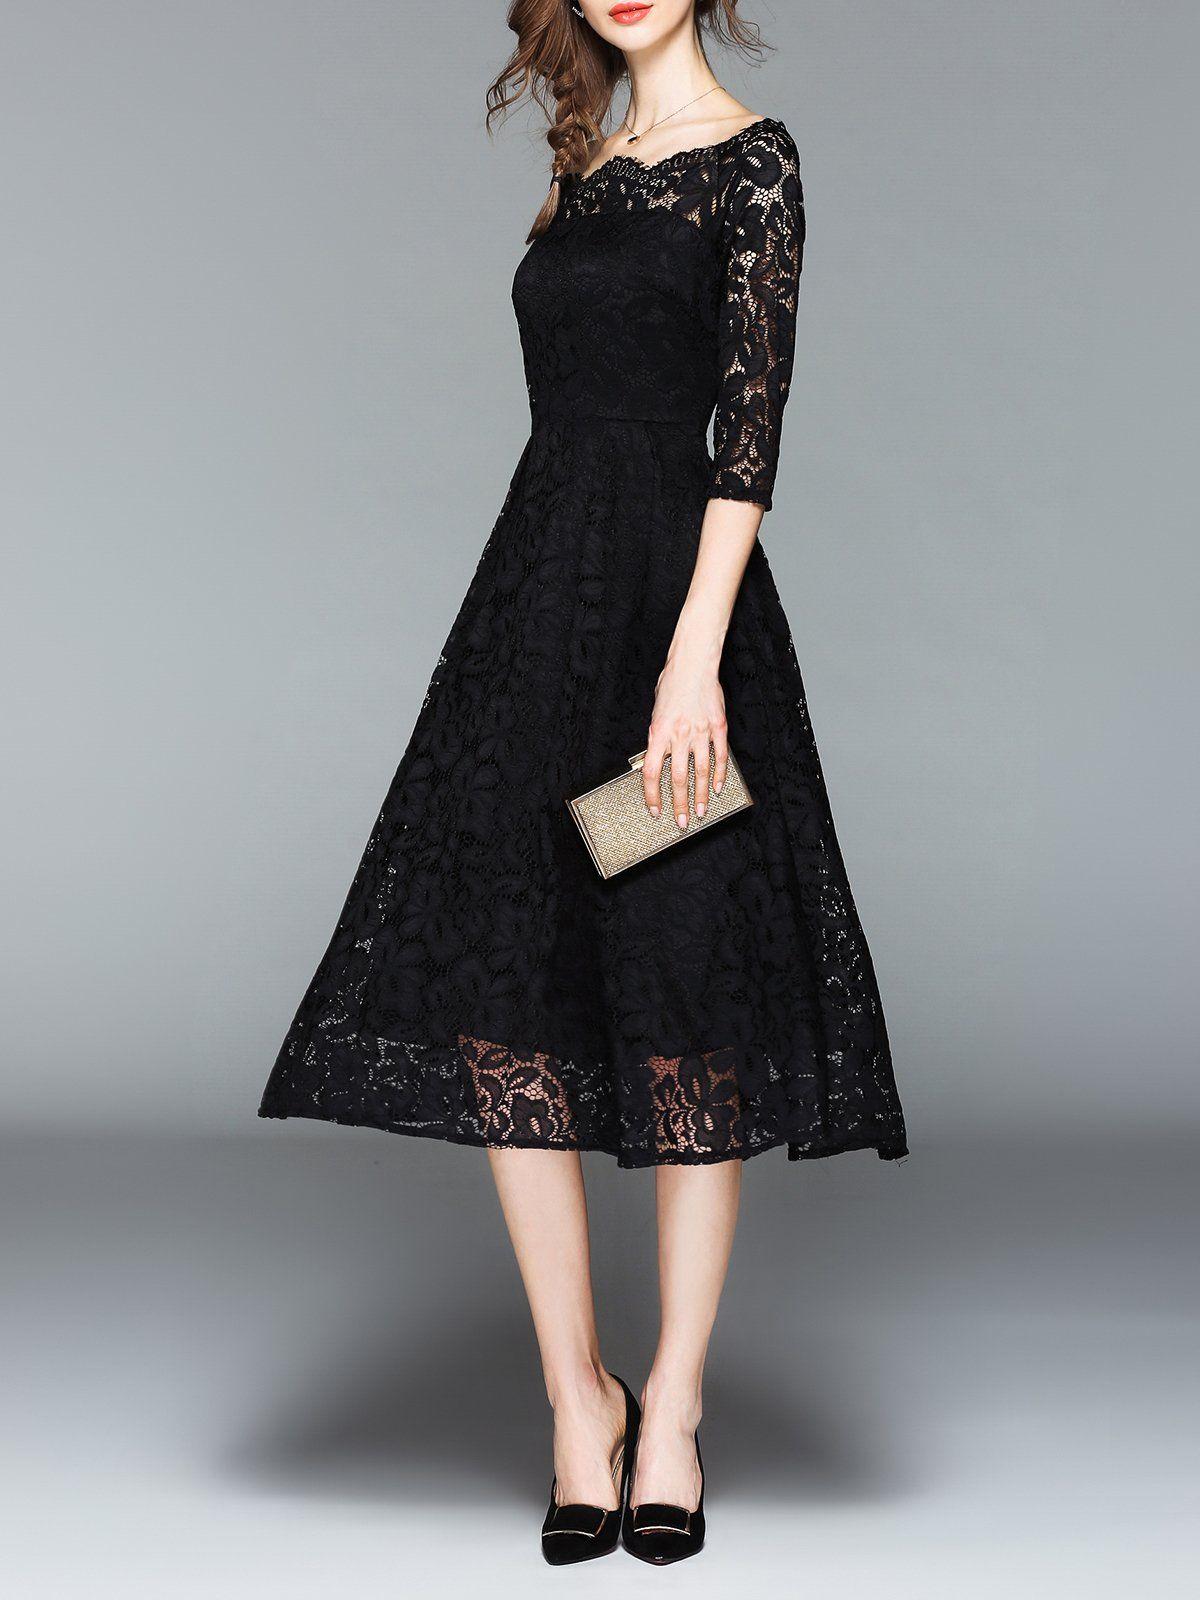 Stand Collar Elegant Guipure Lace 3 4 Sleeve Dress Black Lace Midi Dress Dresses Womens Midi Dresses [ 1600 x 1200 Pixel ]